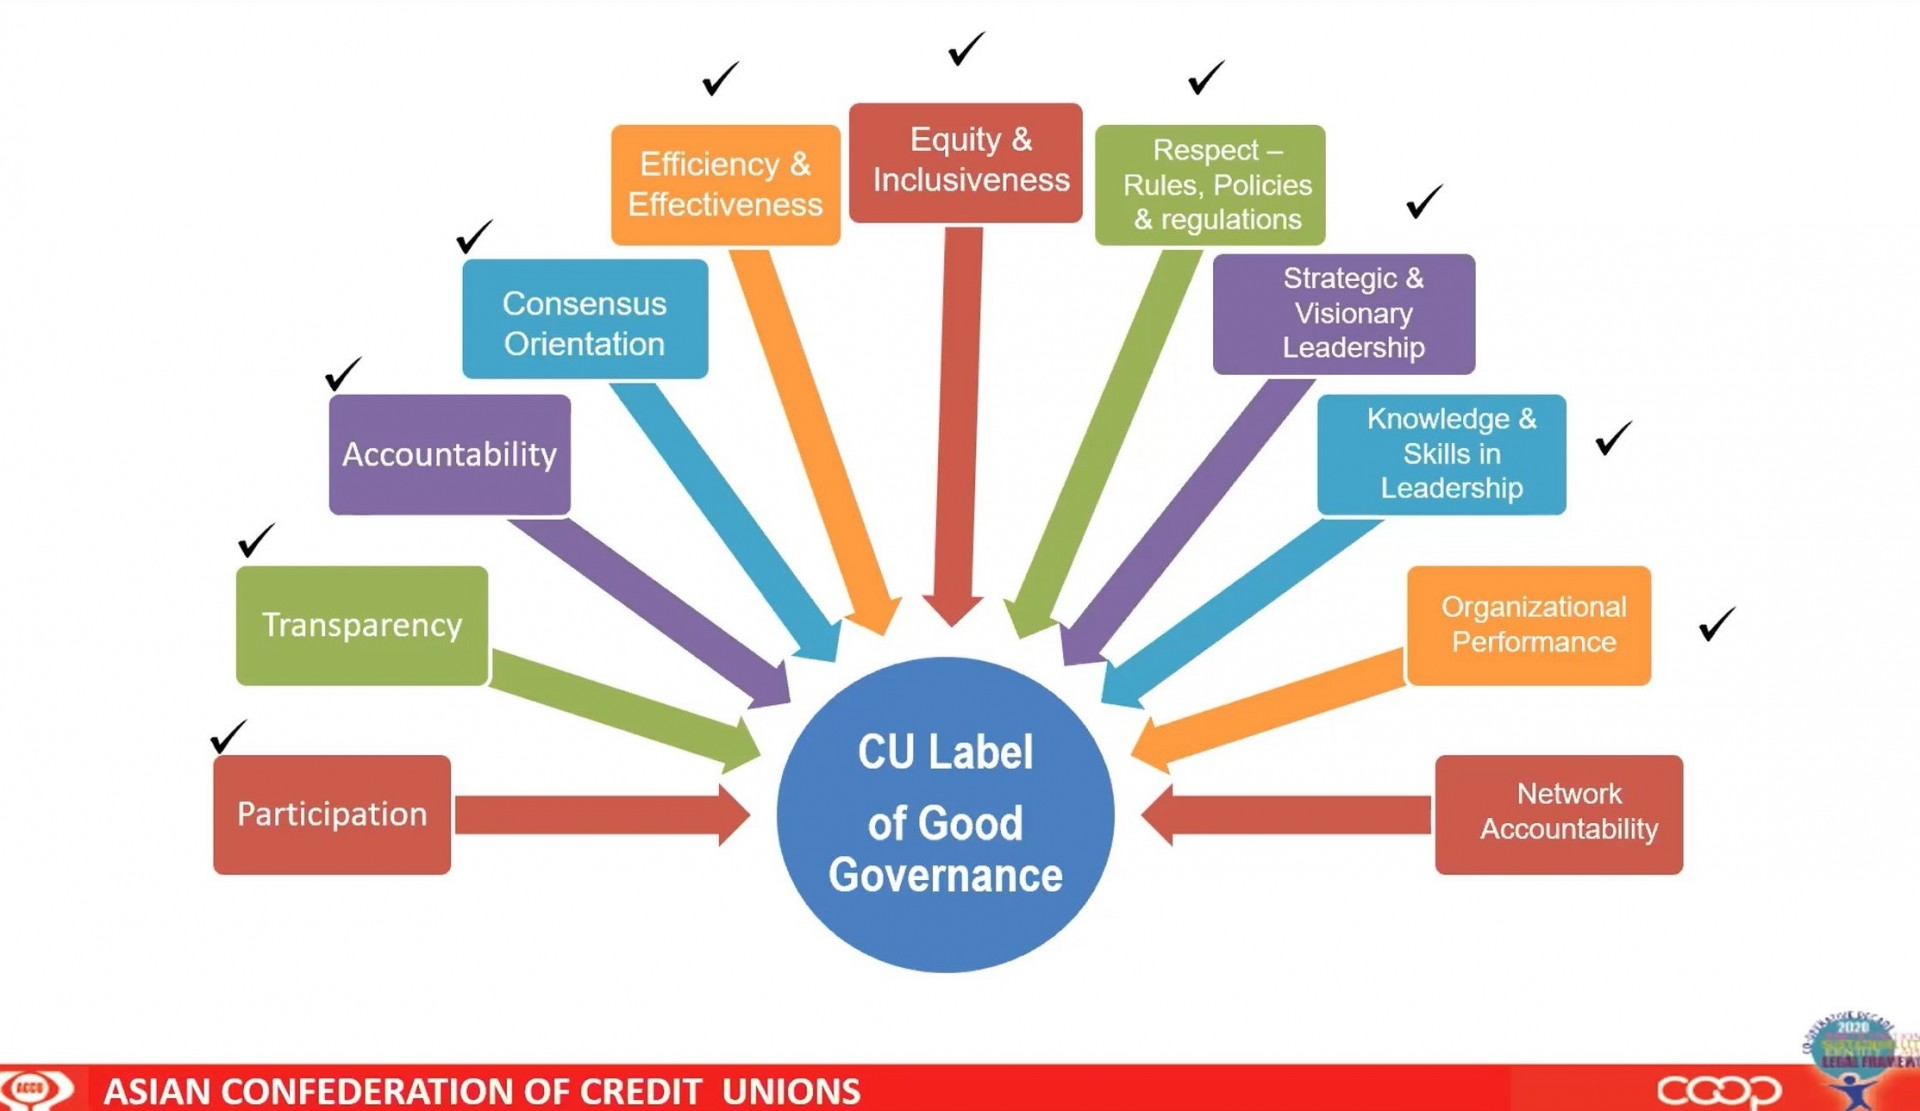 CULEG, Label Keunggulan CU dalam Tata Kelola